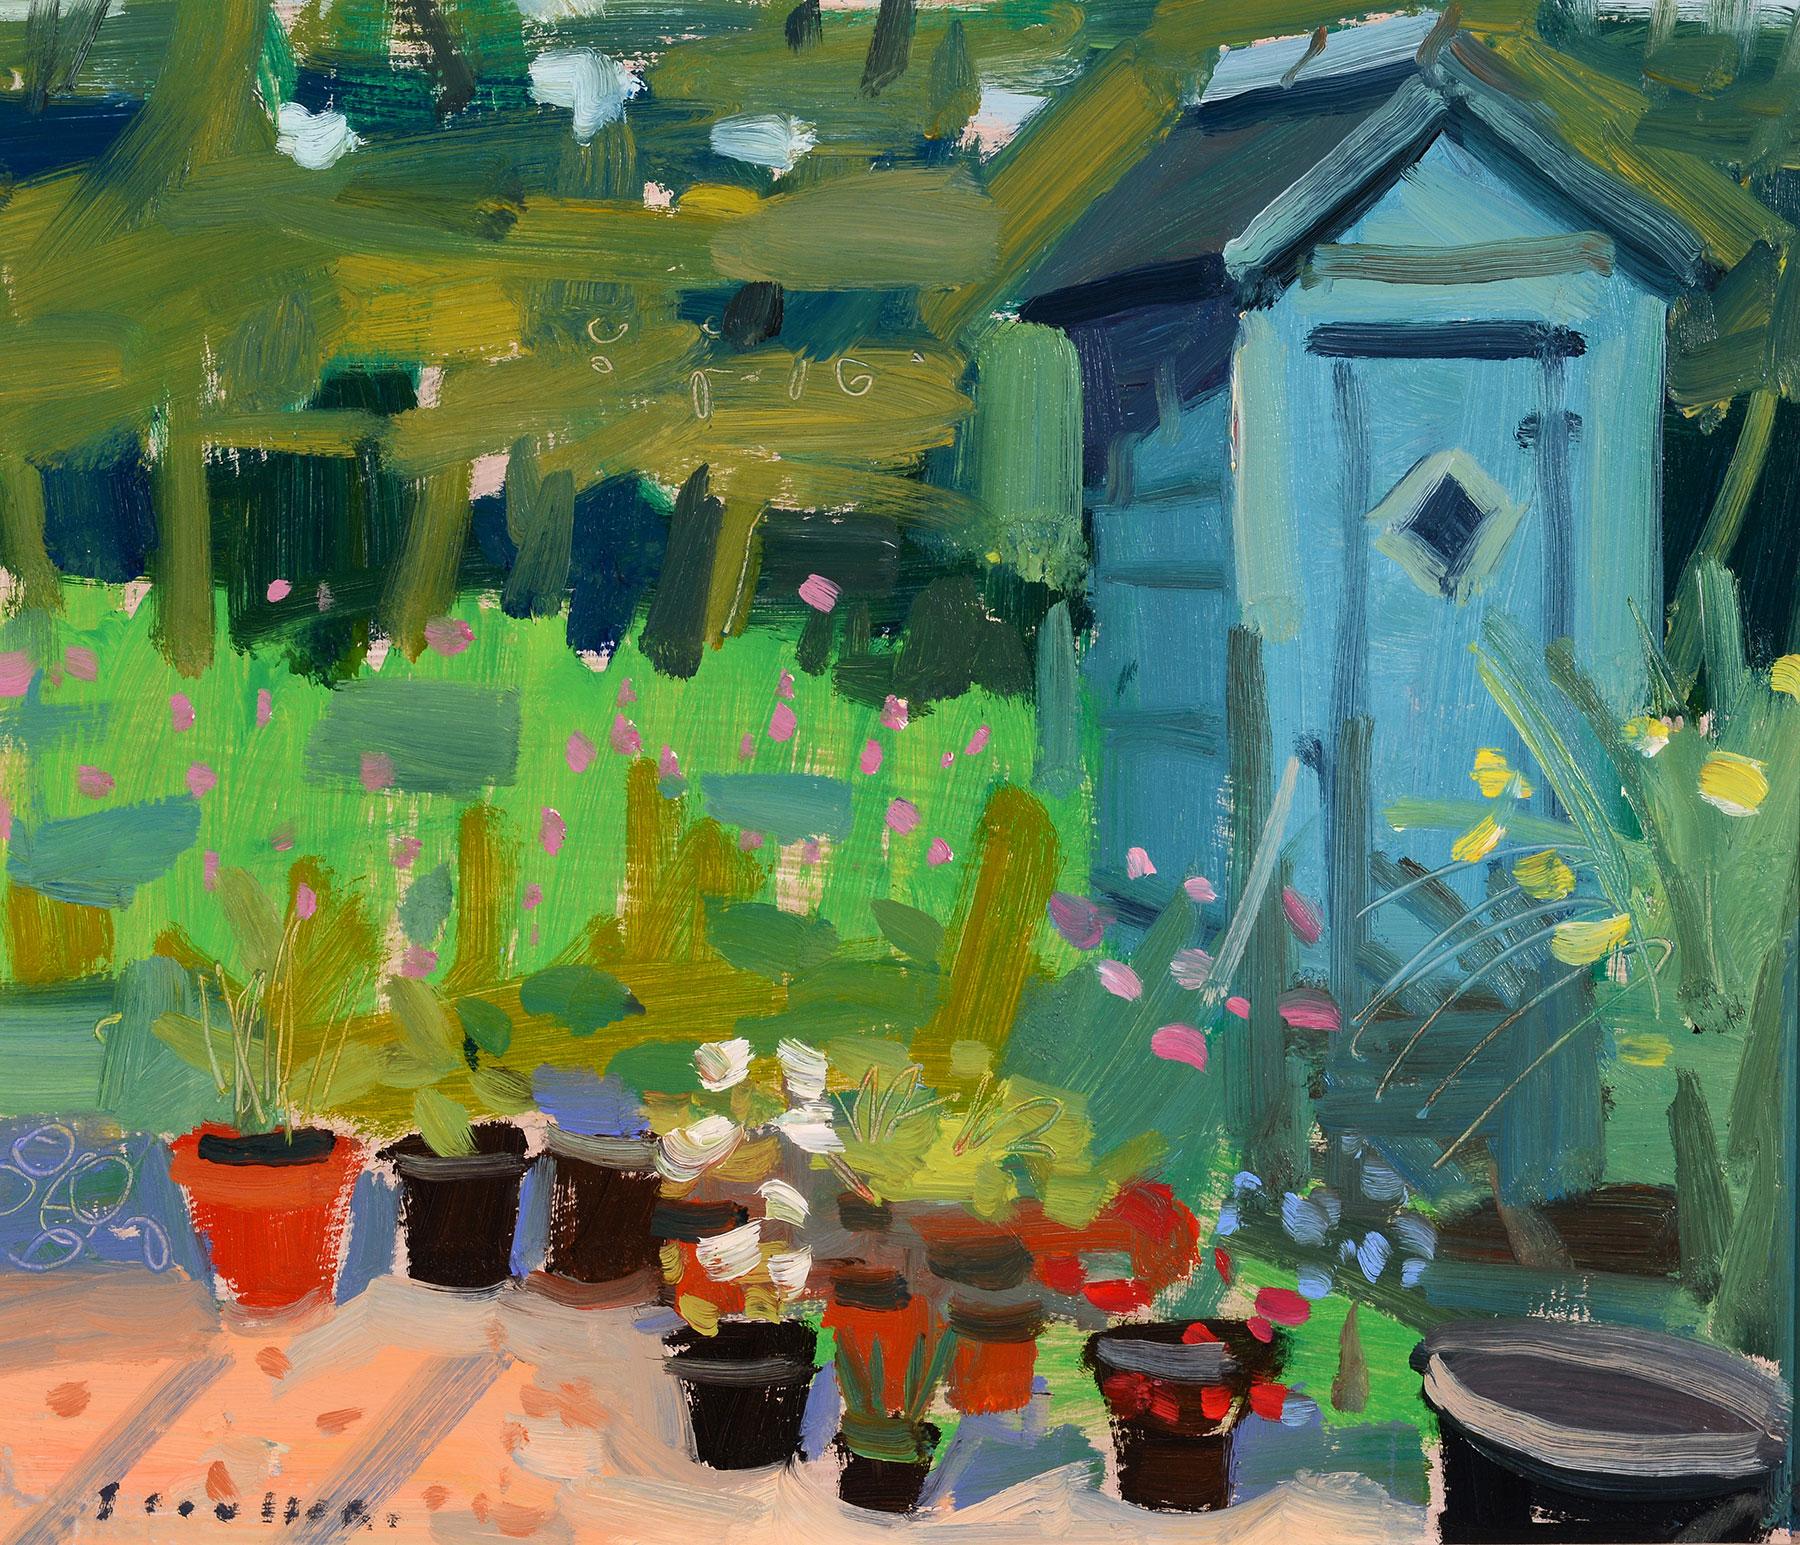 Glen Scoulier Garden Shed in Summer